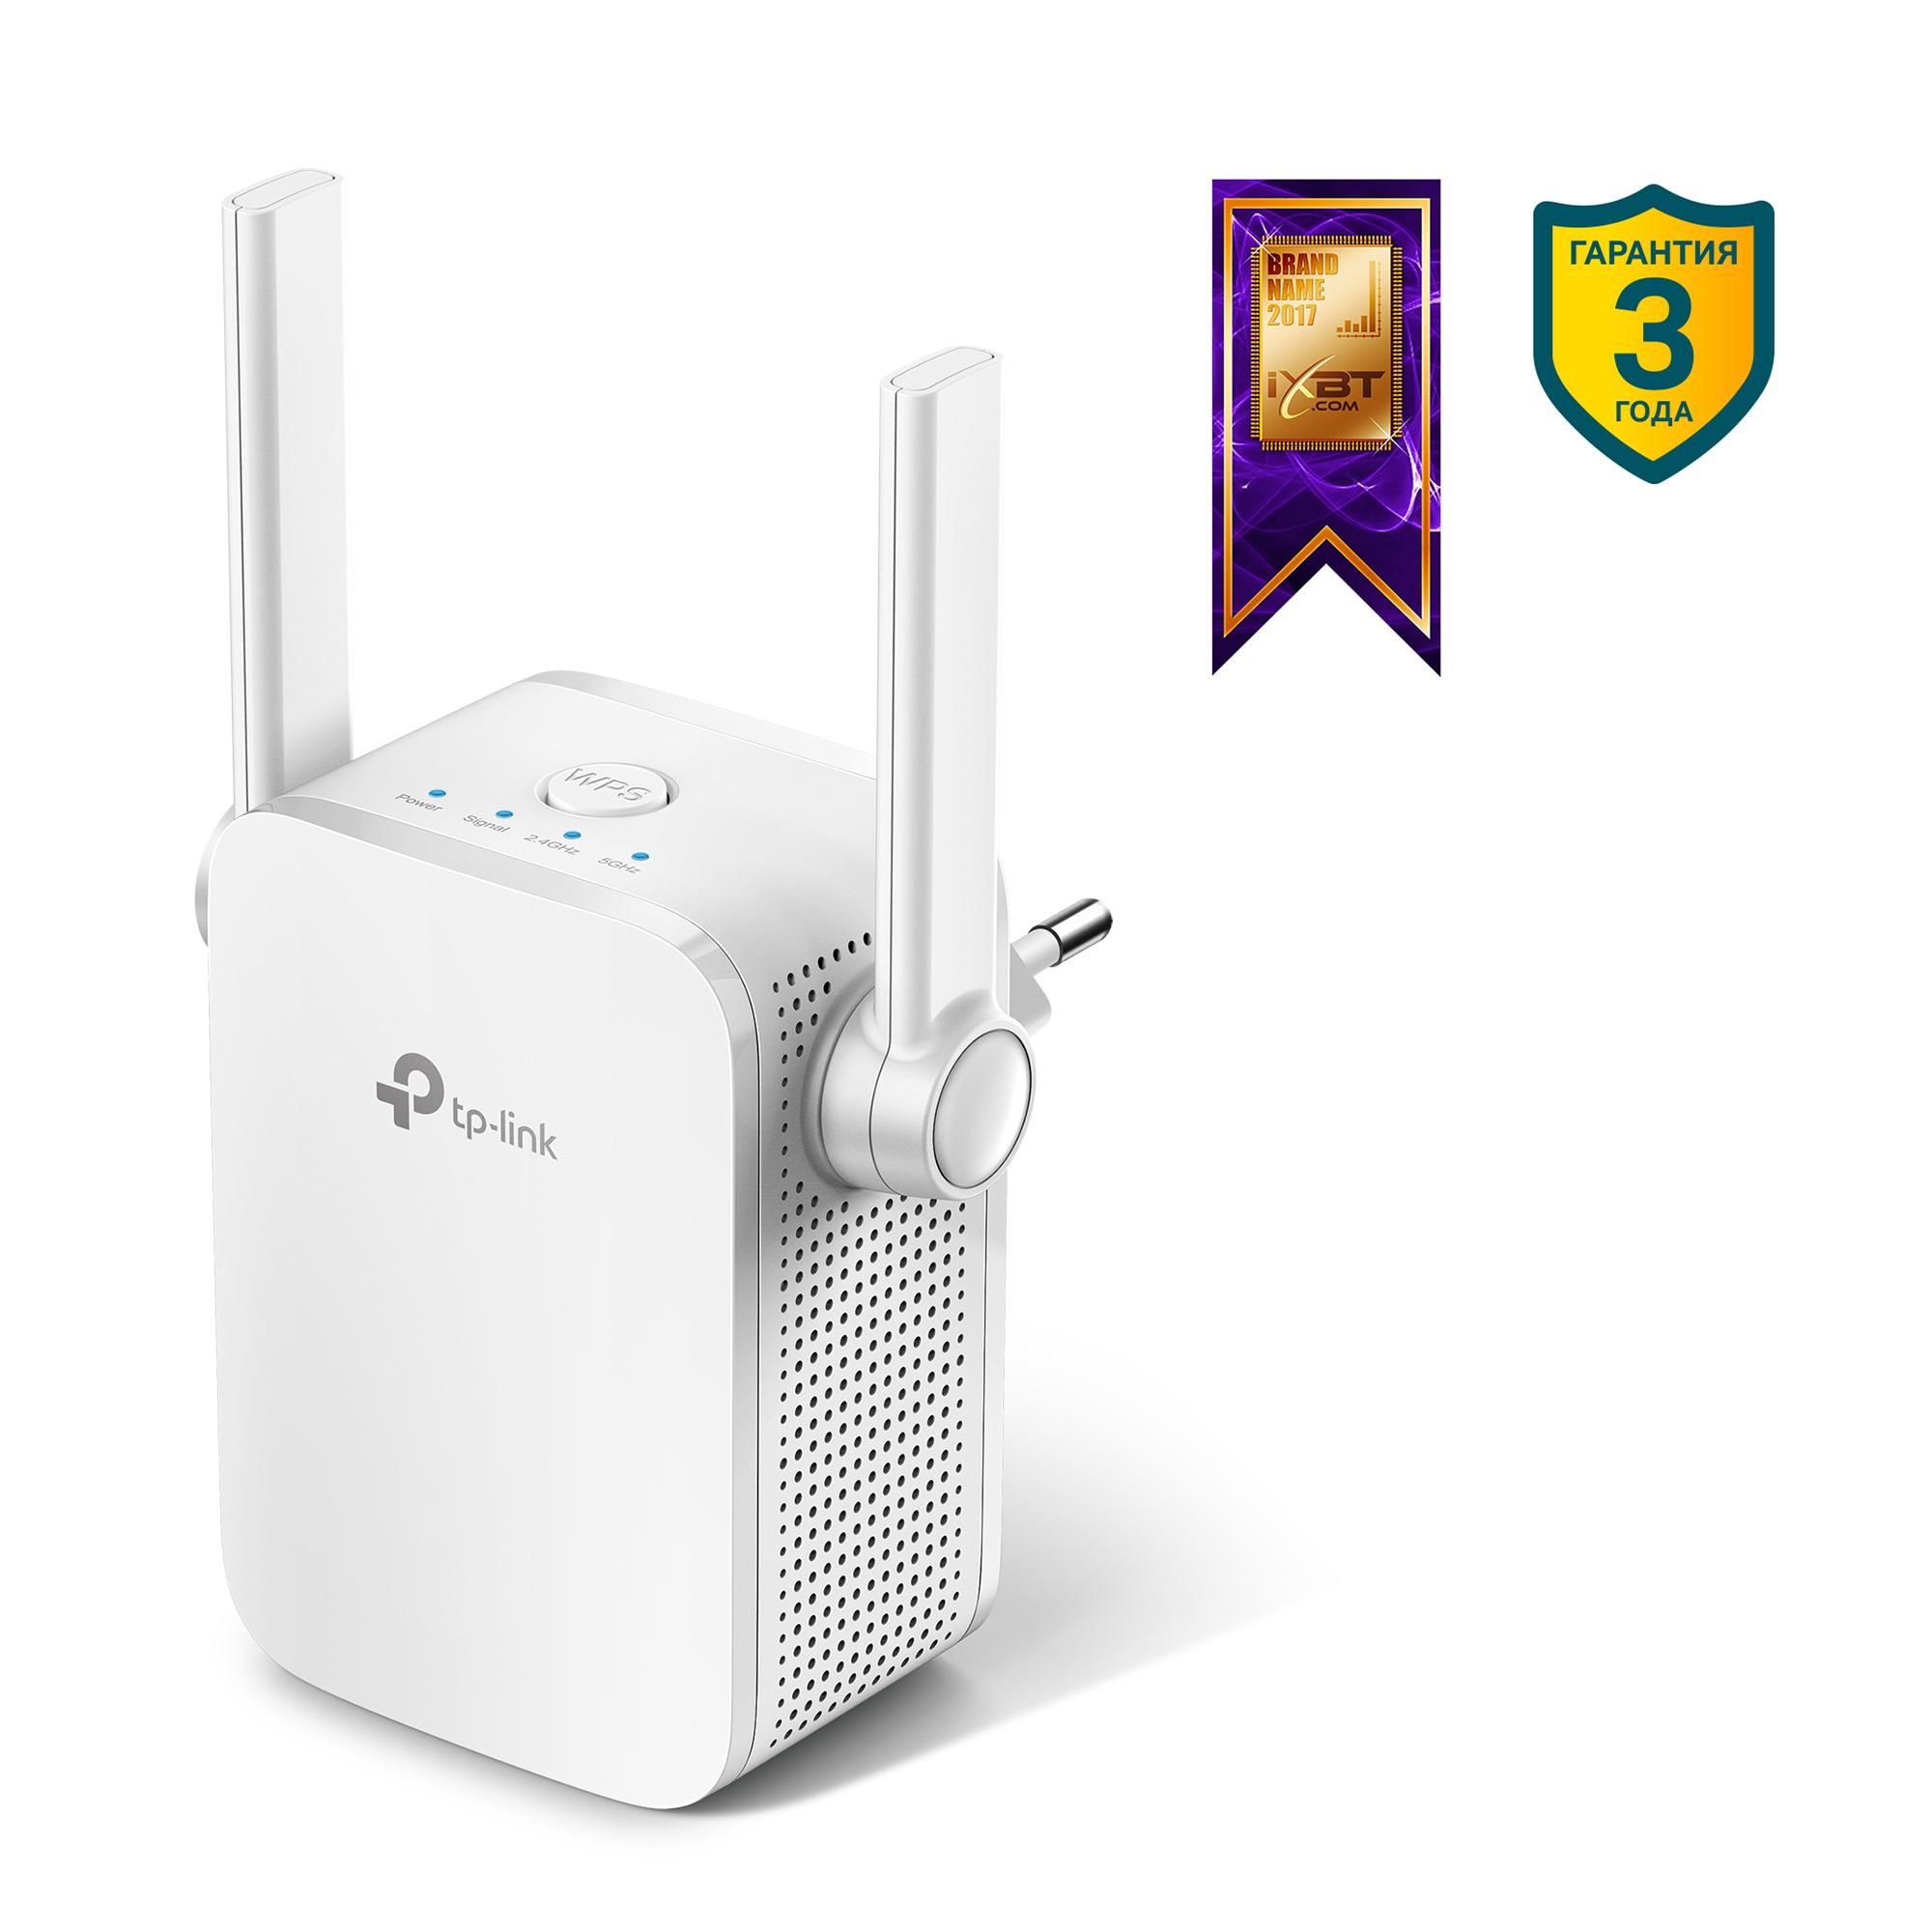 Усилитель сигнала TP-LINK RE205 AC750 Усилитель Wi-Fi сигнала fuers co sensor 85db carbon monoxide detectors lcd photoelectric independent poisoning warning alarm co gas sensor detectors